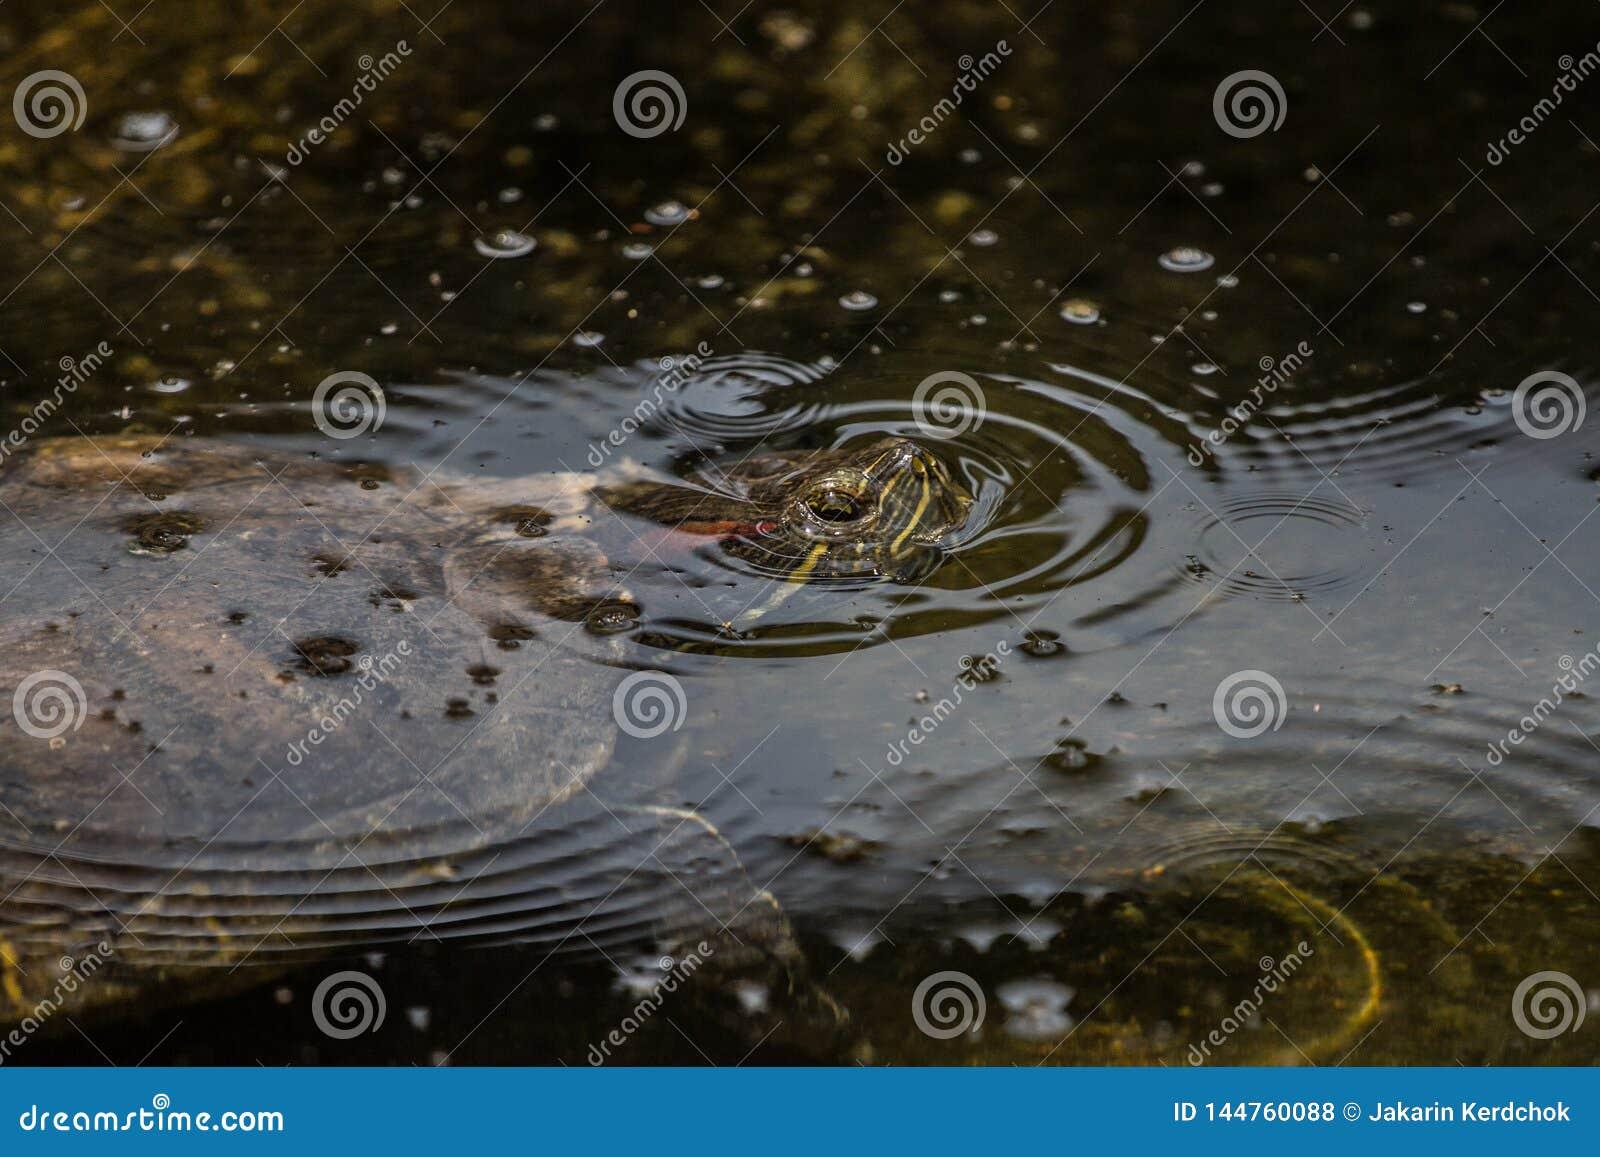 Trachemys scripta elegans in the pond